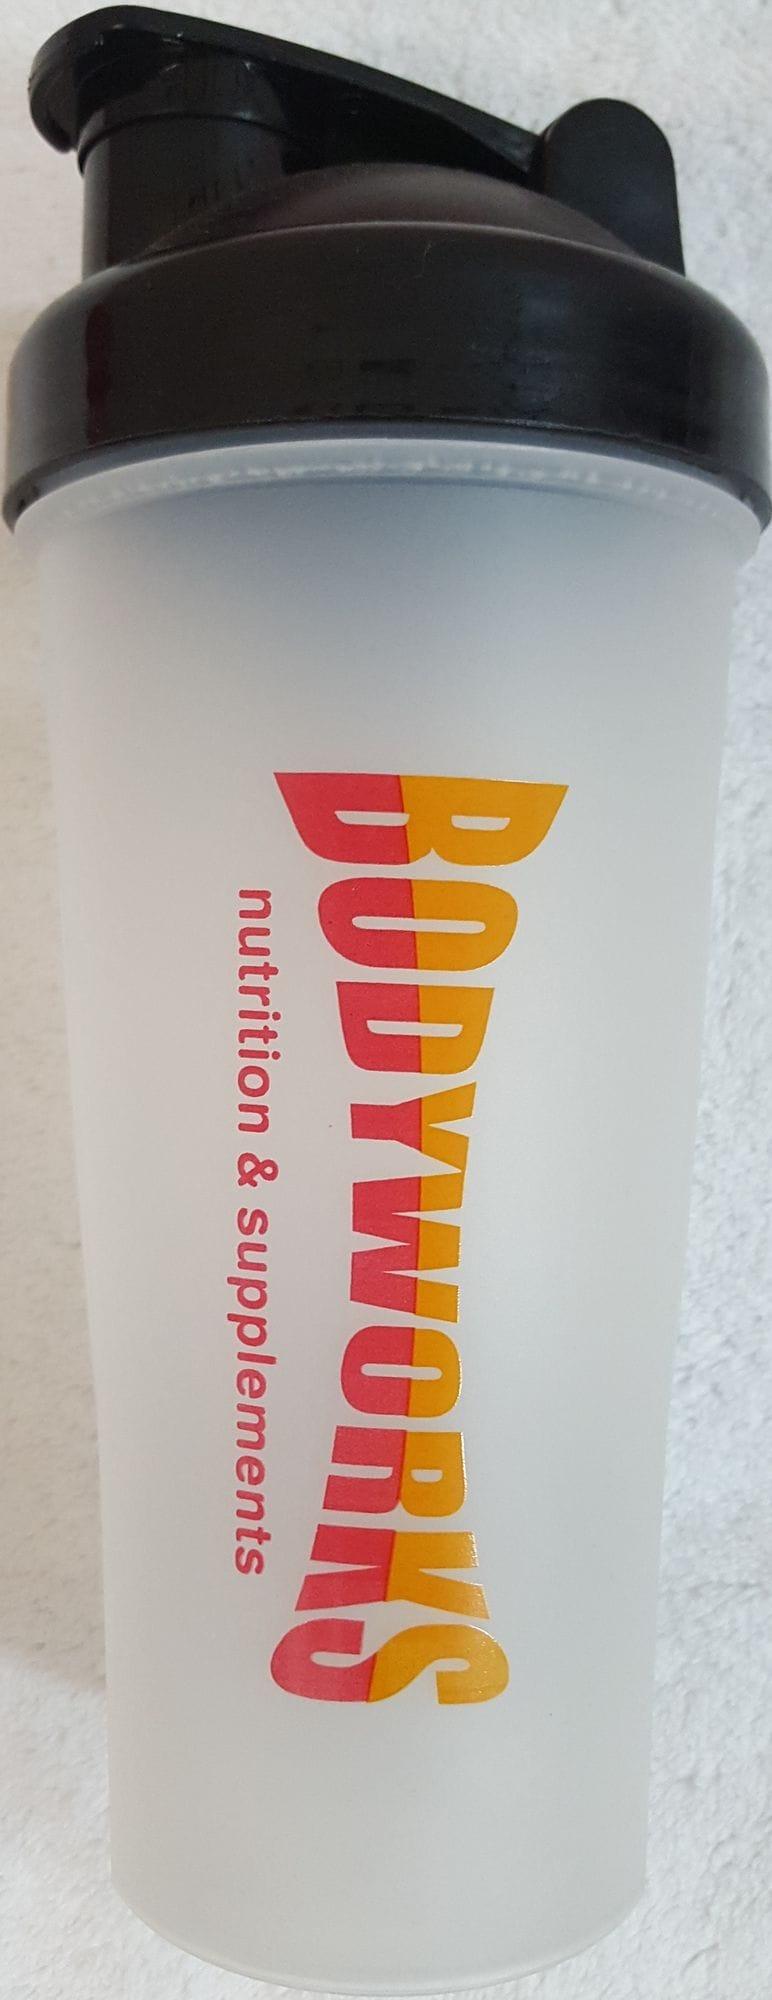 Bodyworks Plastic 600ml Protein Shaker